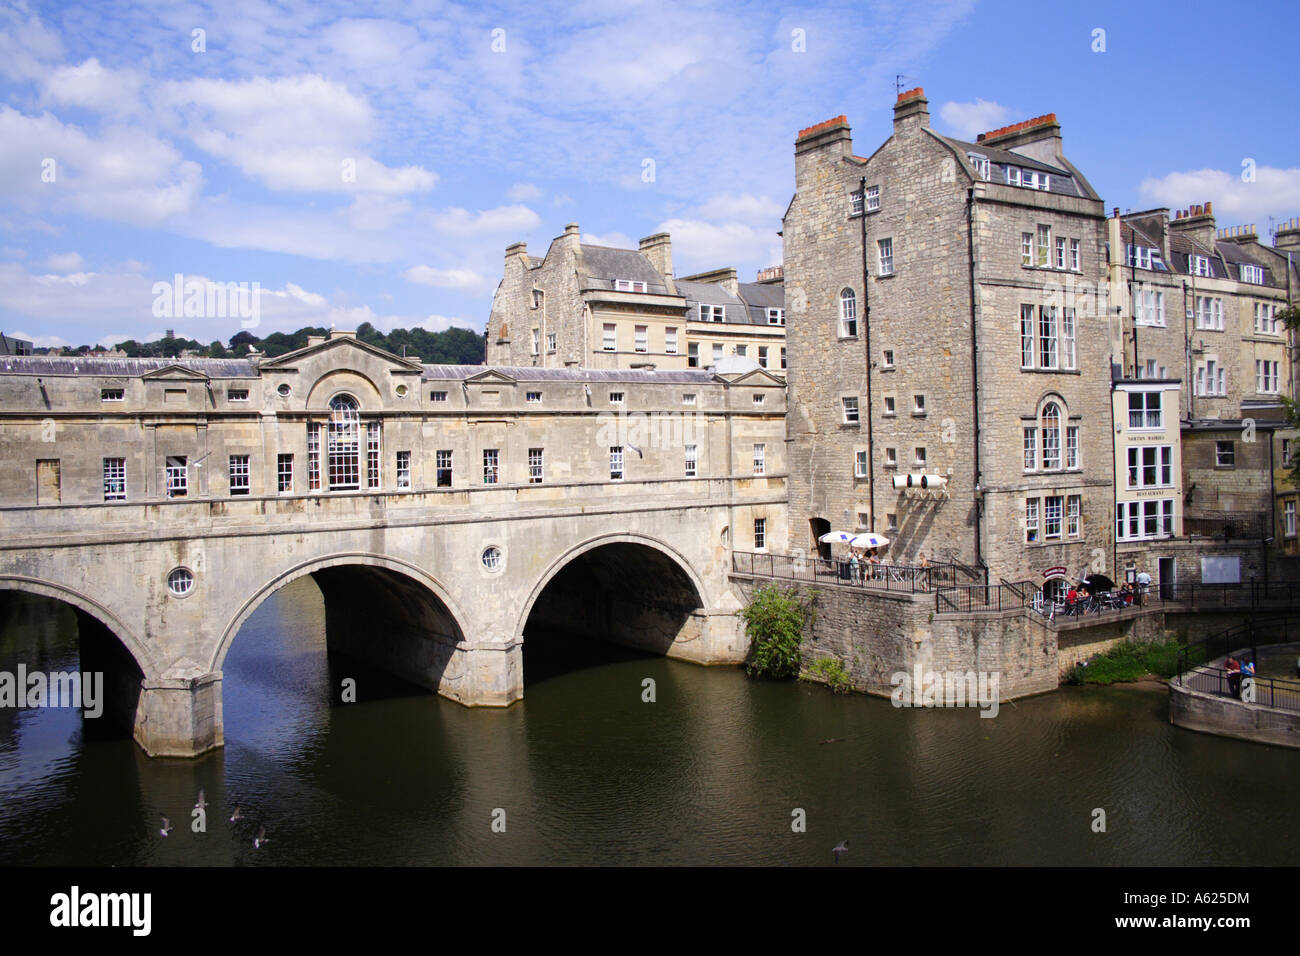 Pulteney Bridge, Bath, Avon, England Stock Photo